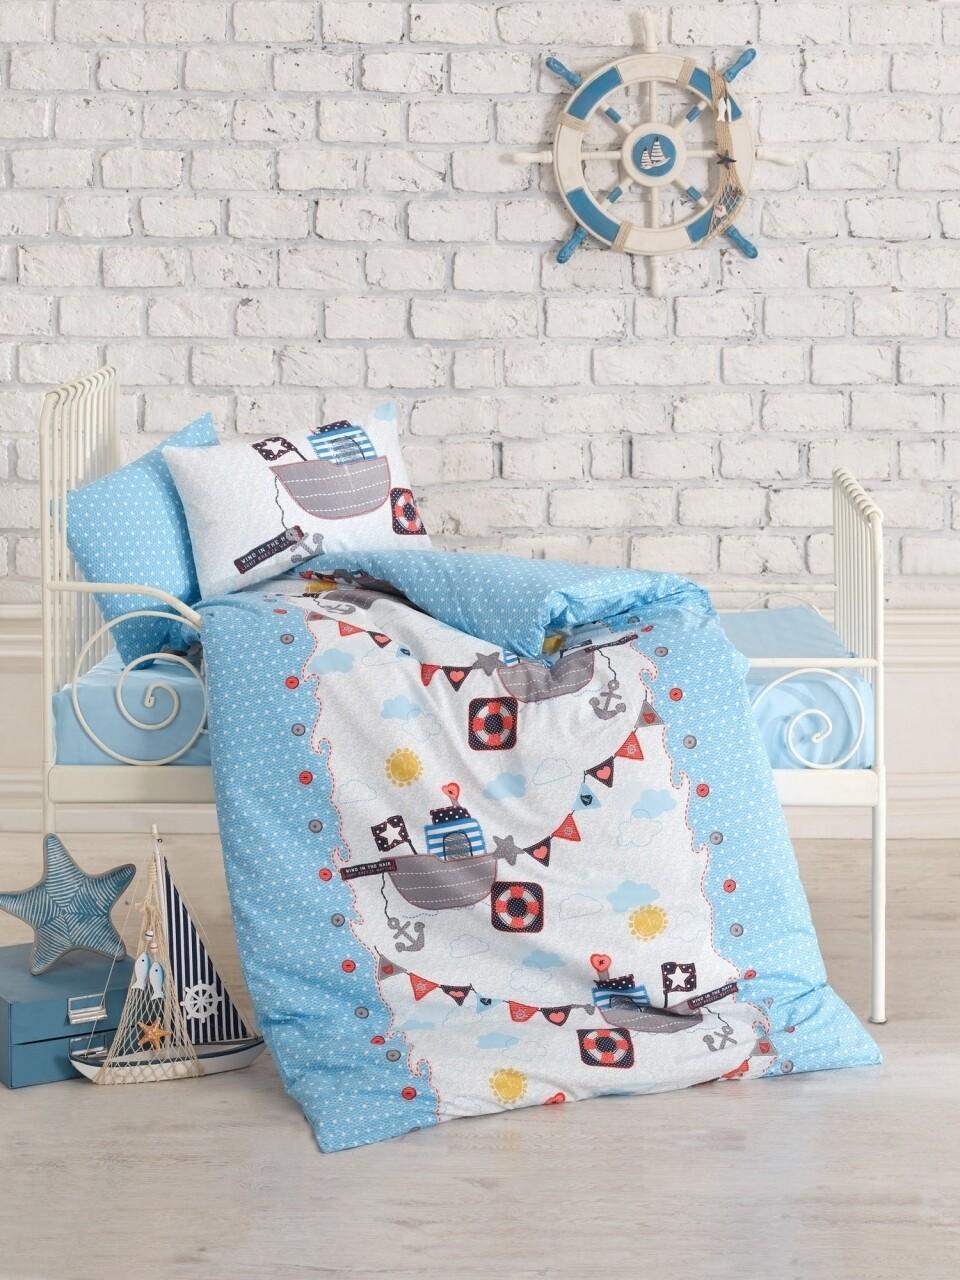 Lenjerie de pat pentru copii, 4 piese, 100% bumbac ranforce, Cotton Box, Vapor